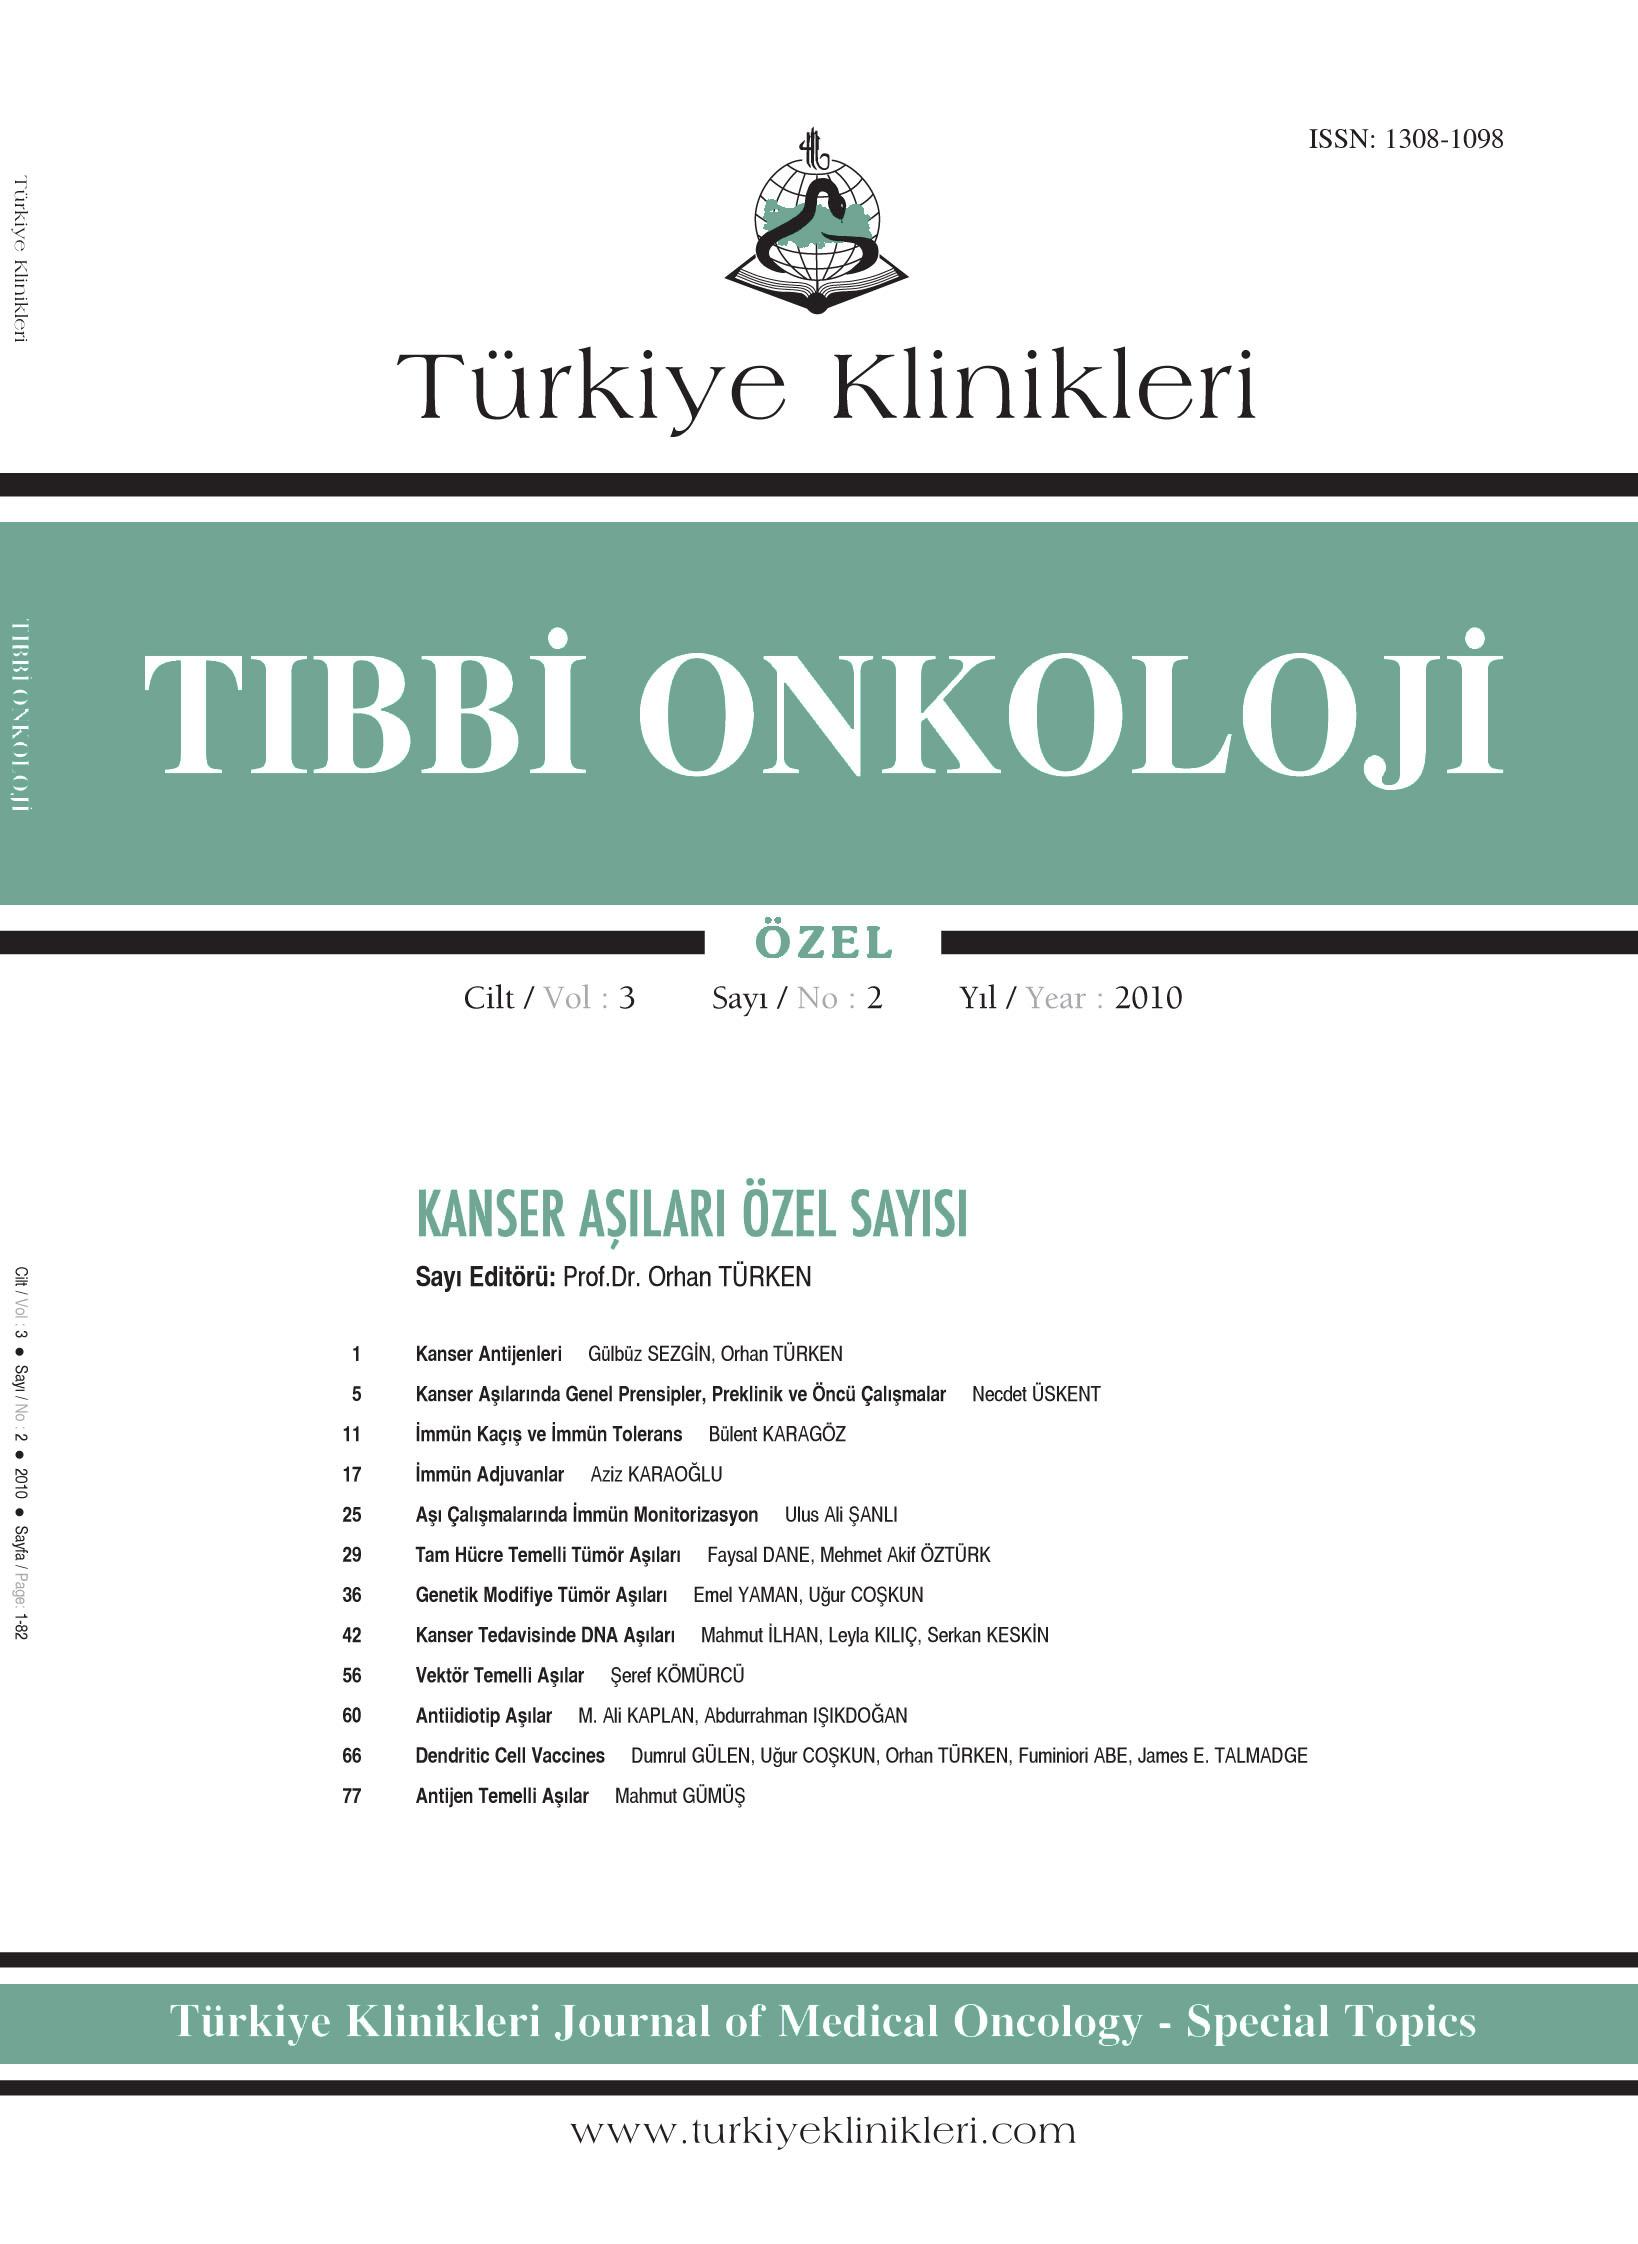 Turkiye Klinikleri Medical Oncology Special Topics Archieve